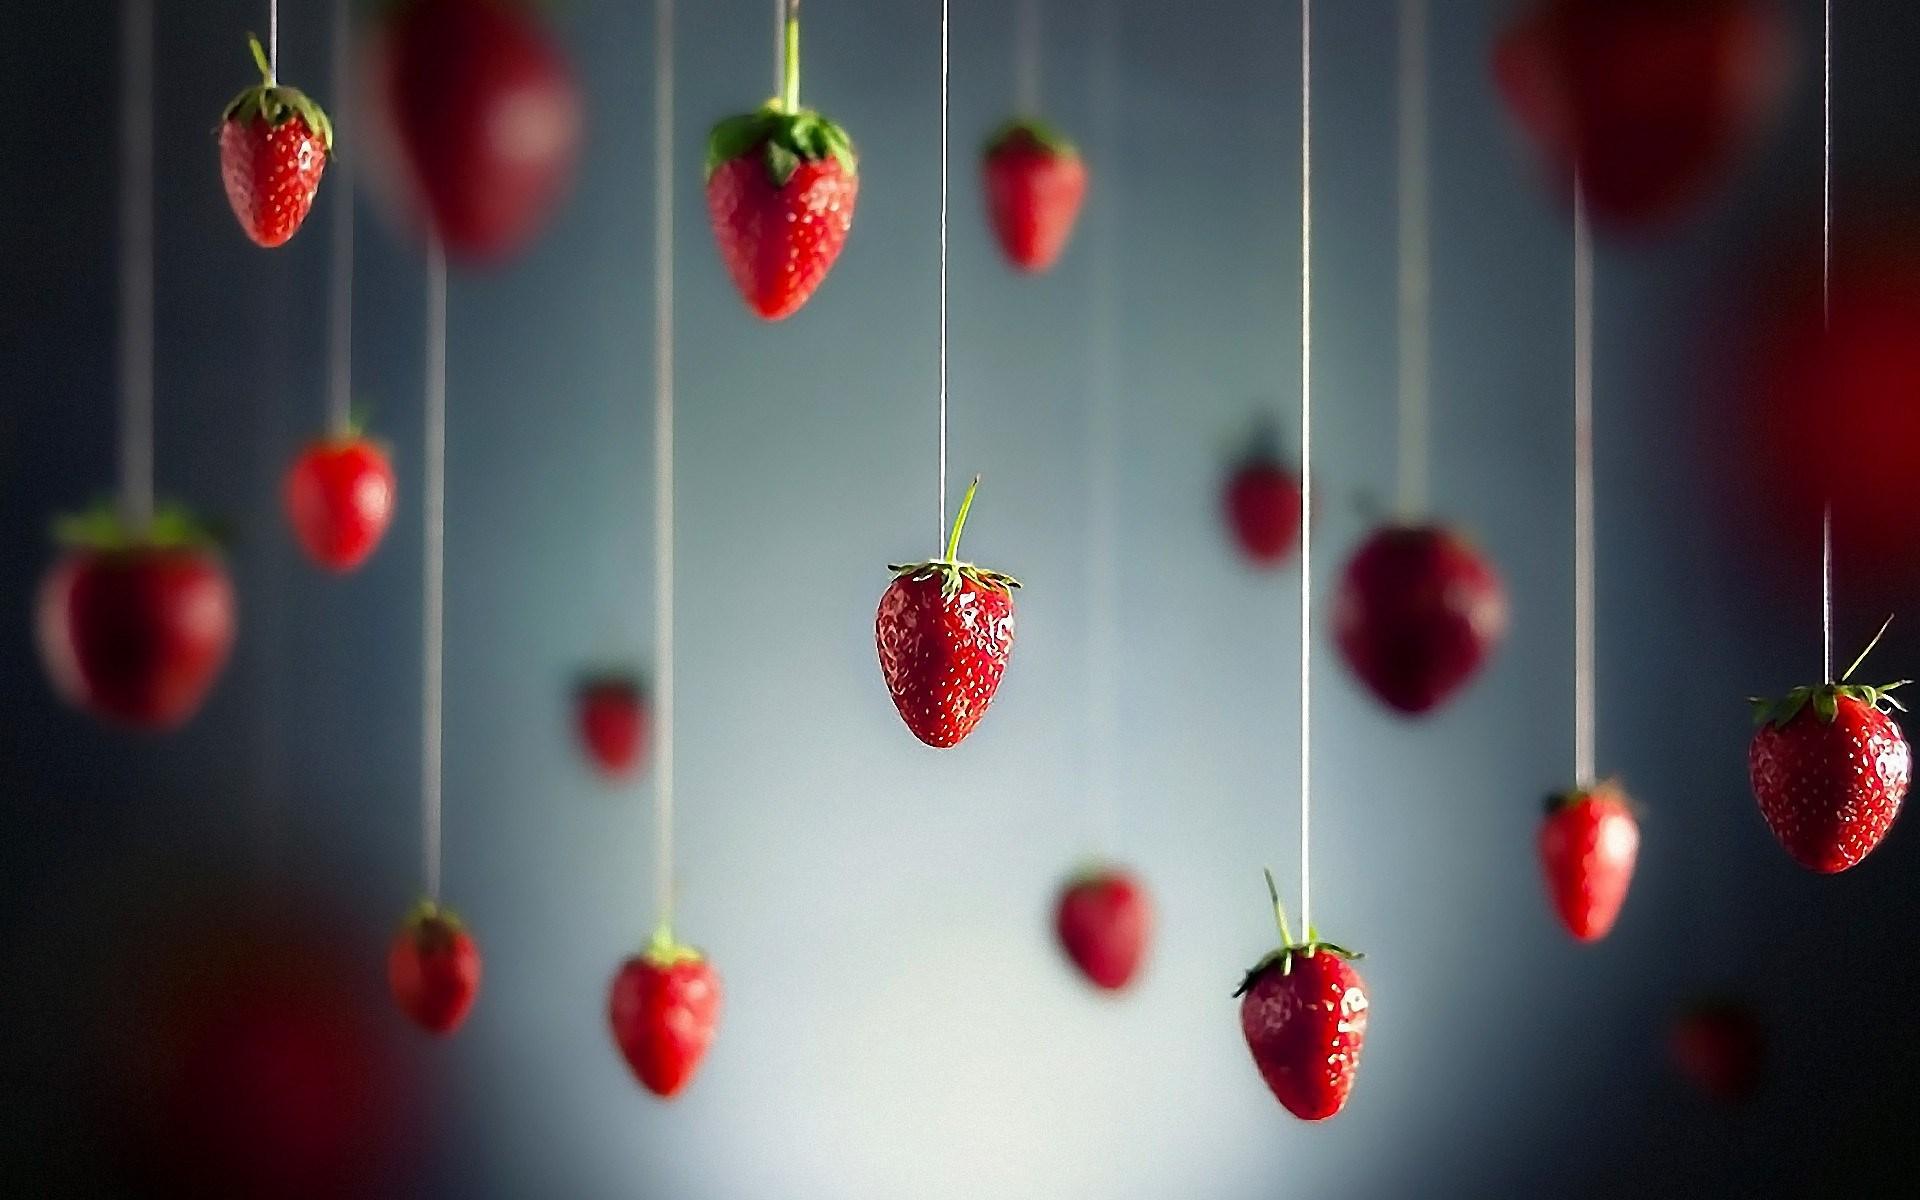 Minimalistic Fruits Hanging Strawberry Wallpaper 1920x1200